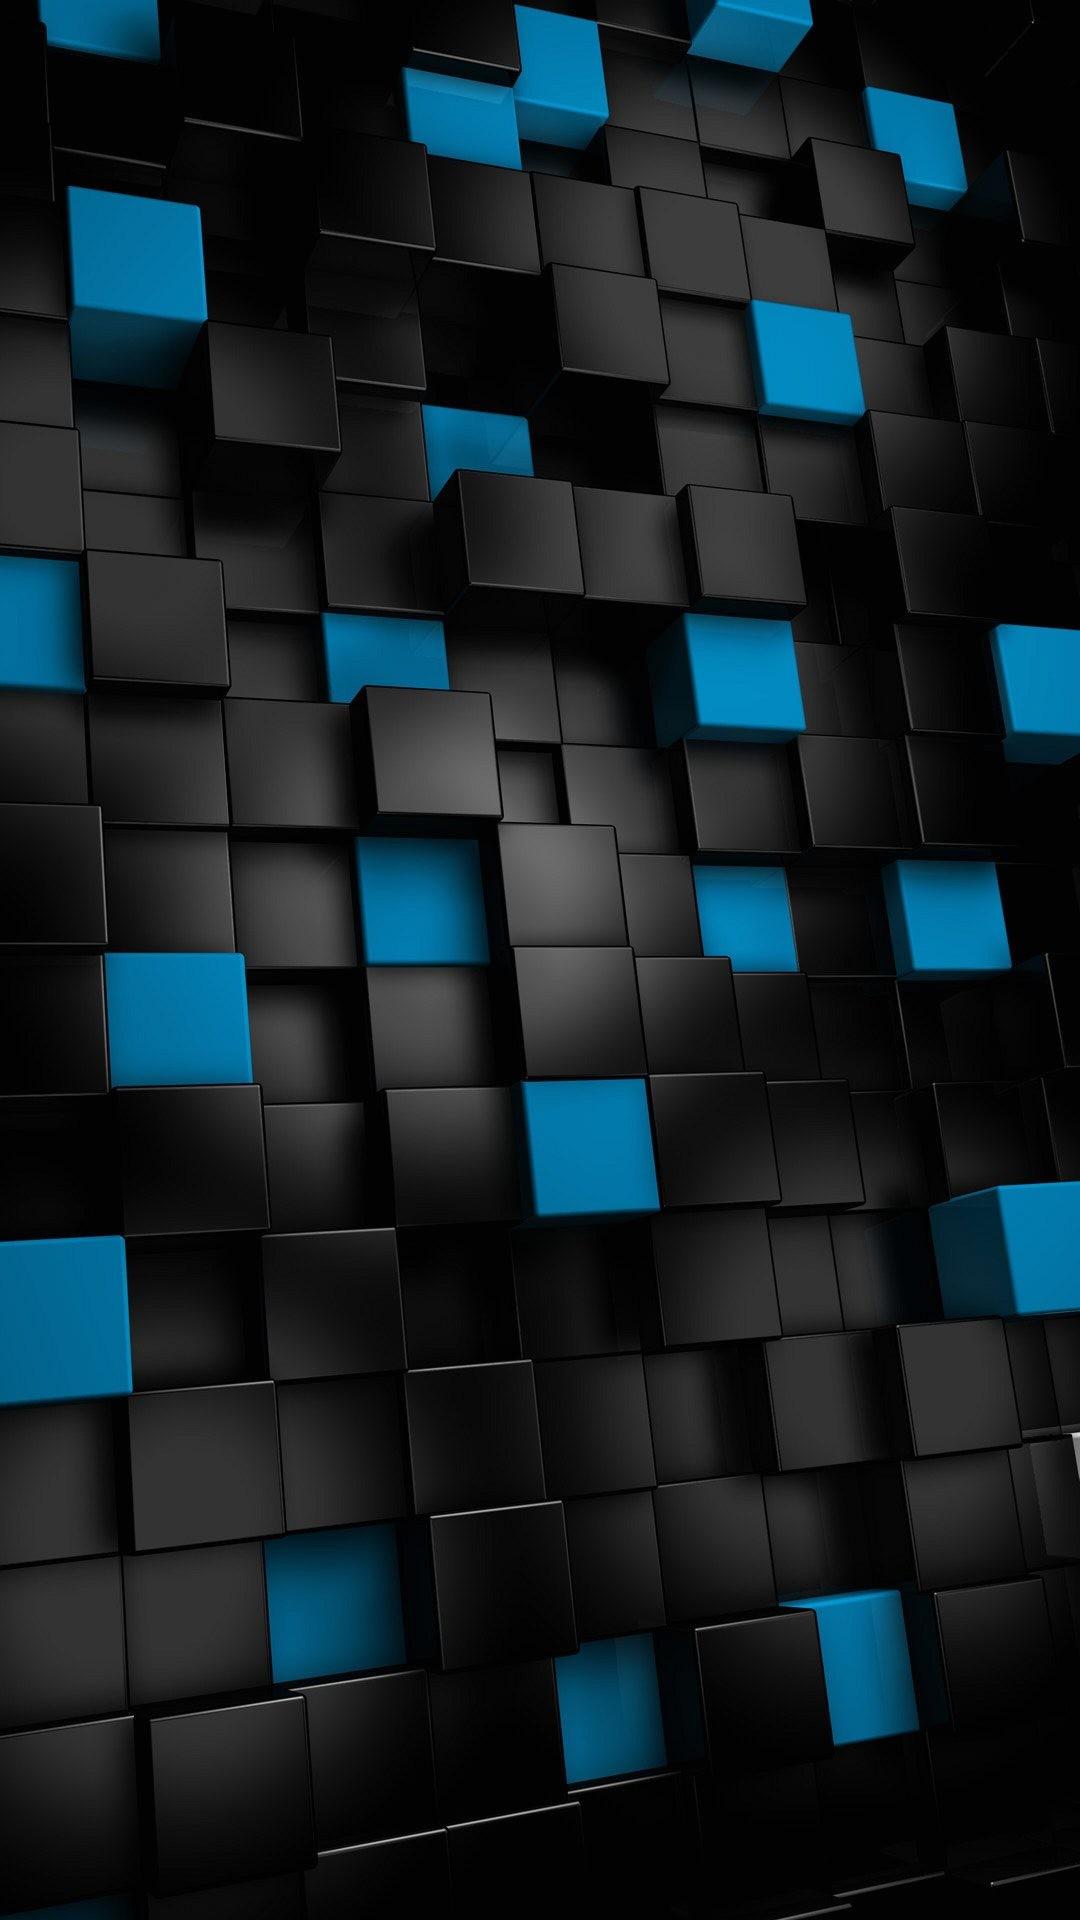 Wallpaper full hd 1080 x 1920 smartphone 3d cubes black blue